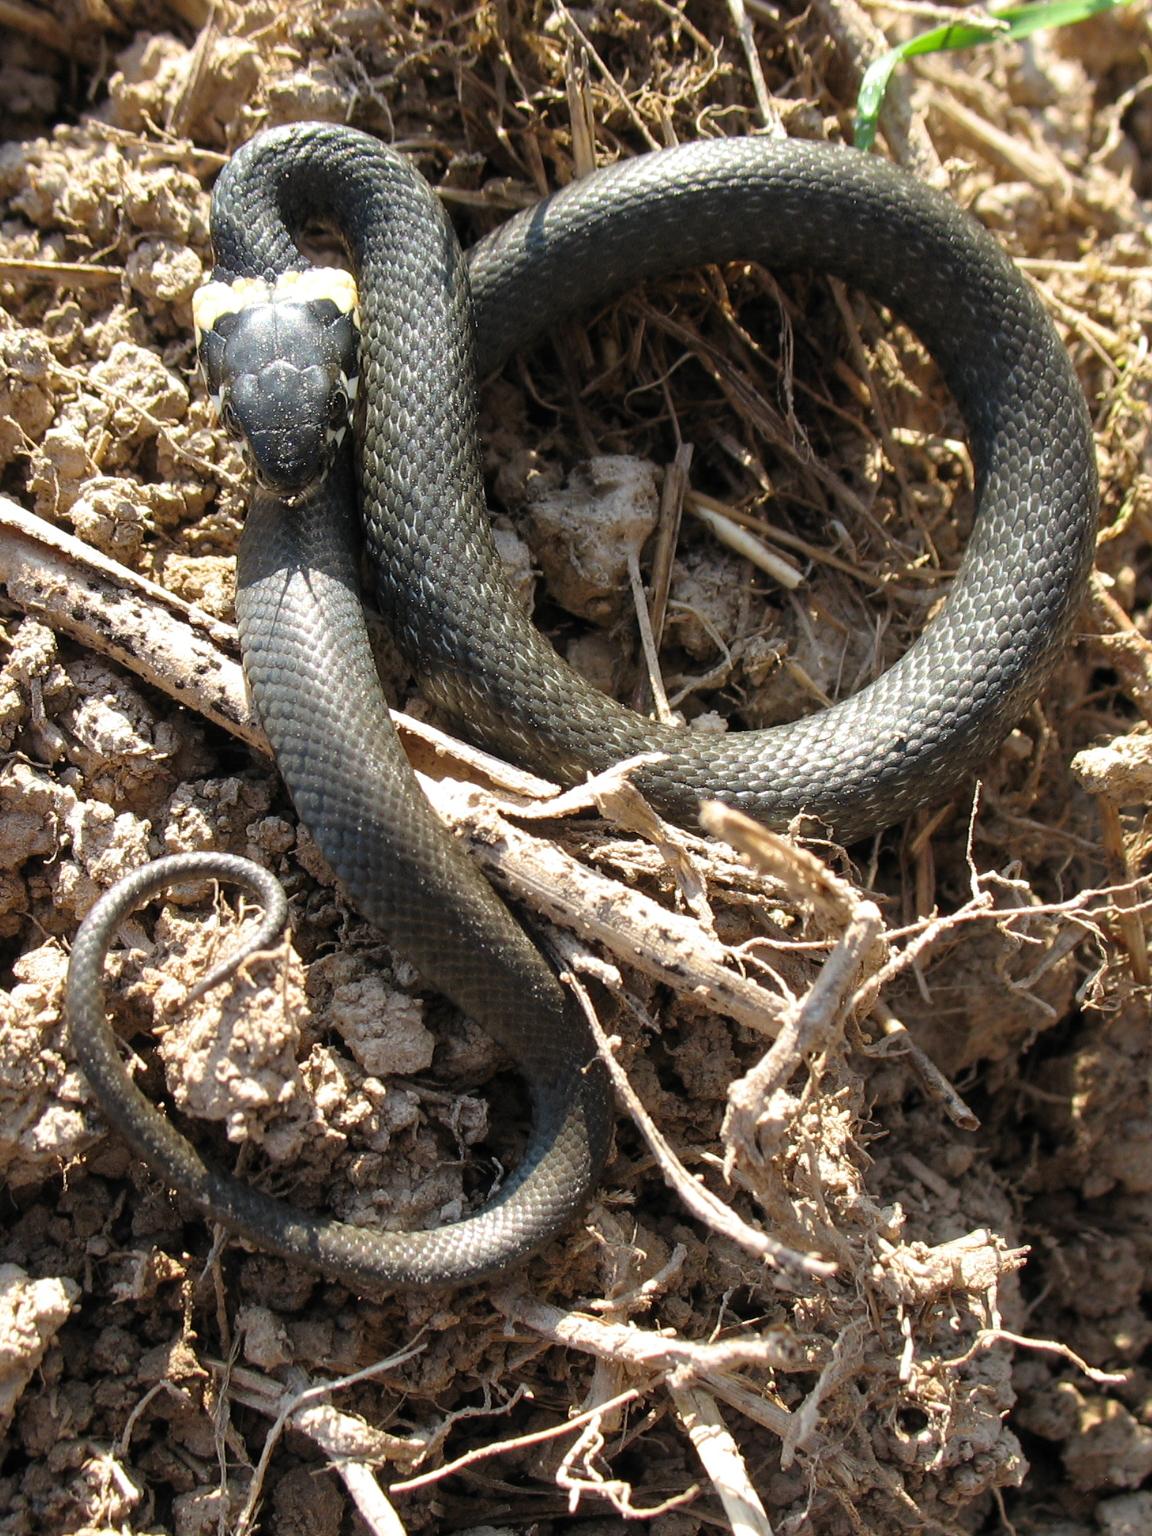 других змеи в брянской области фото политики